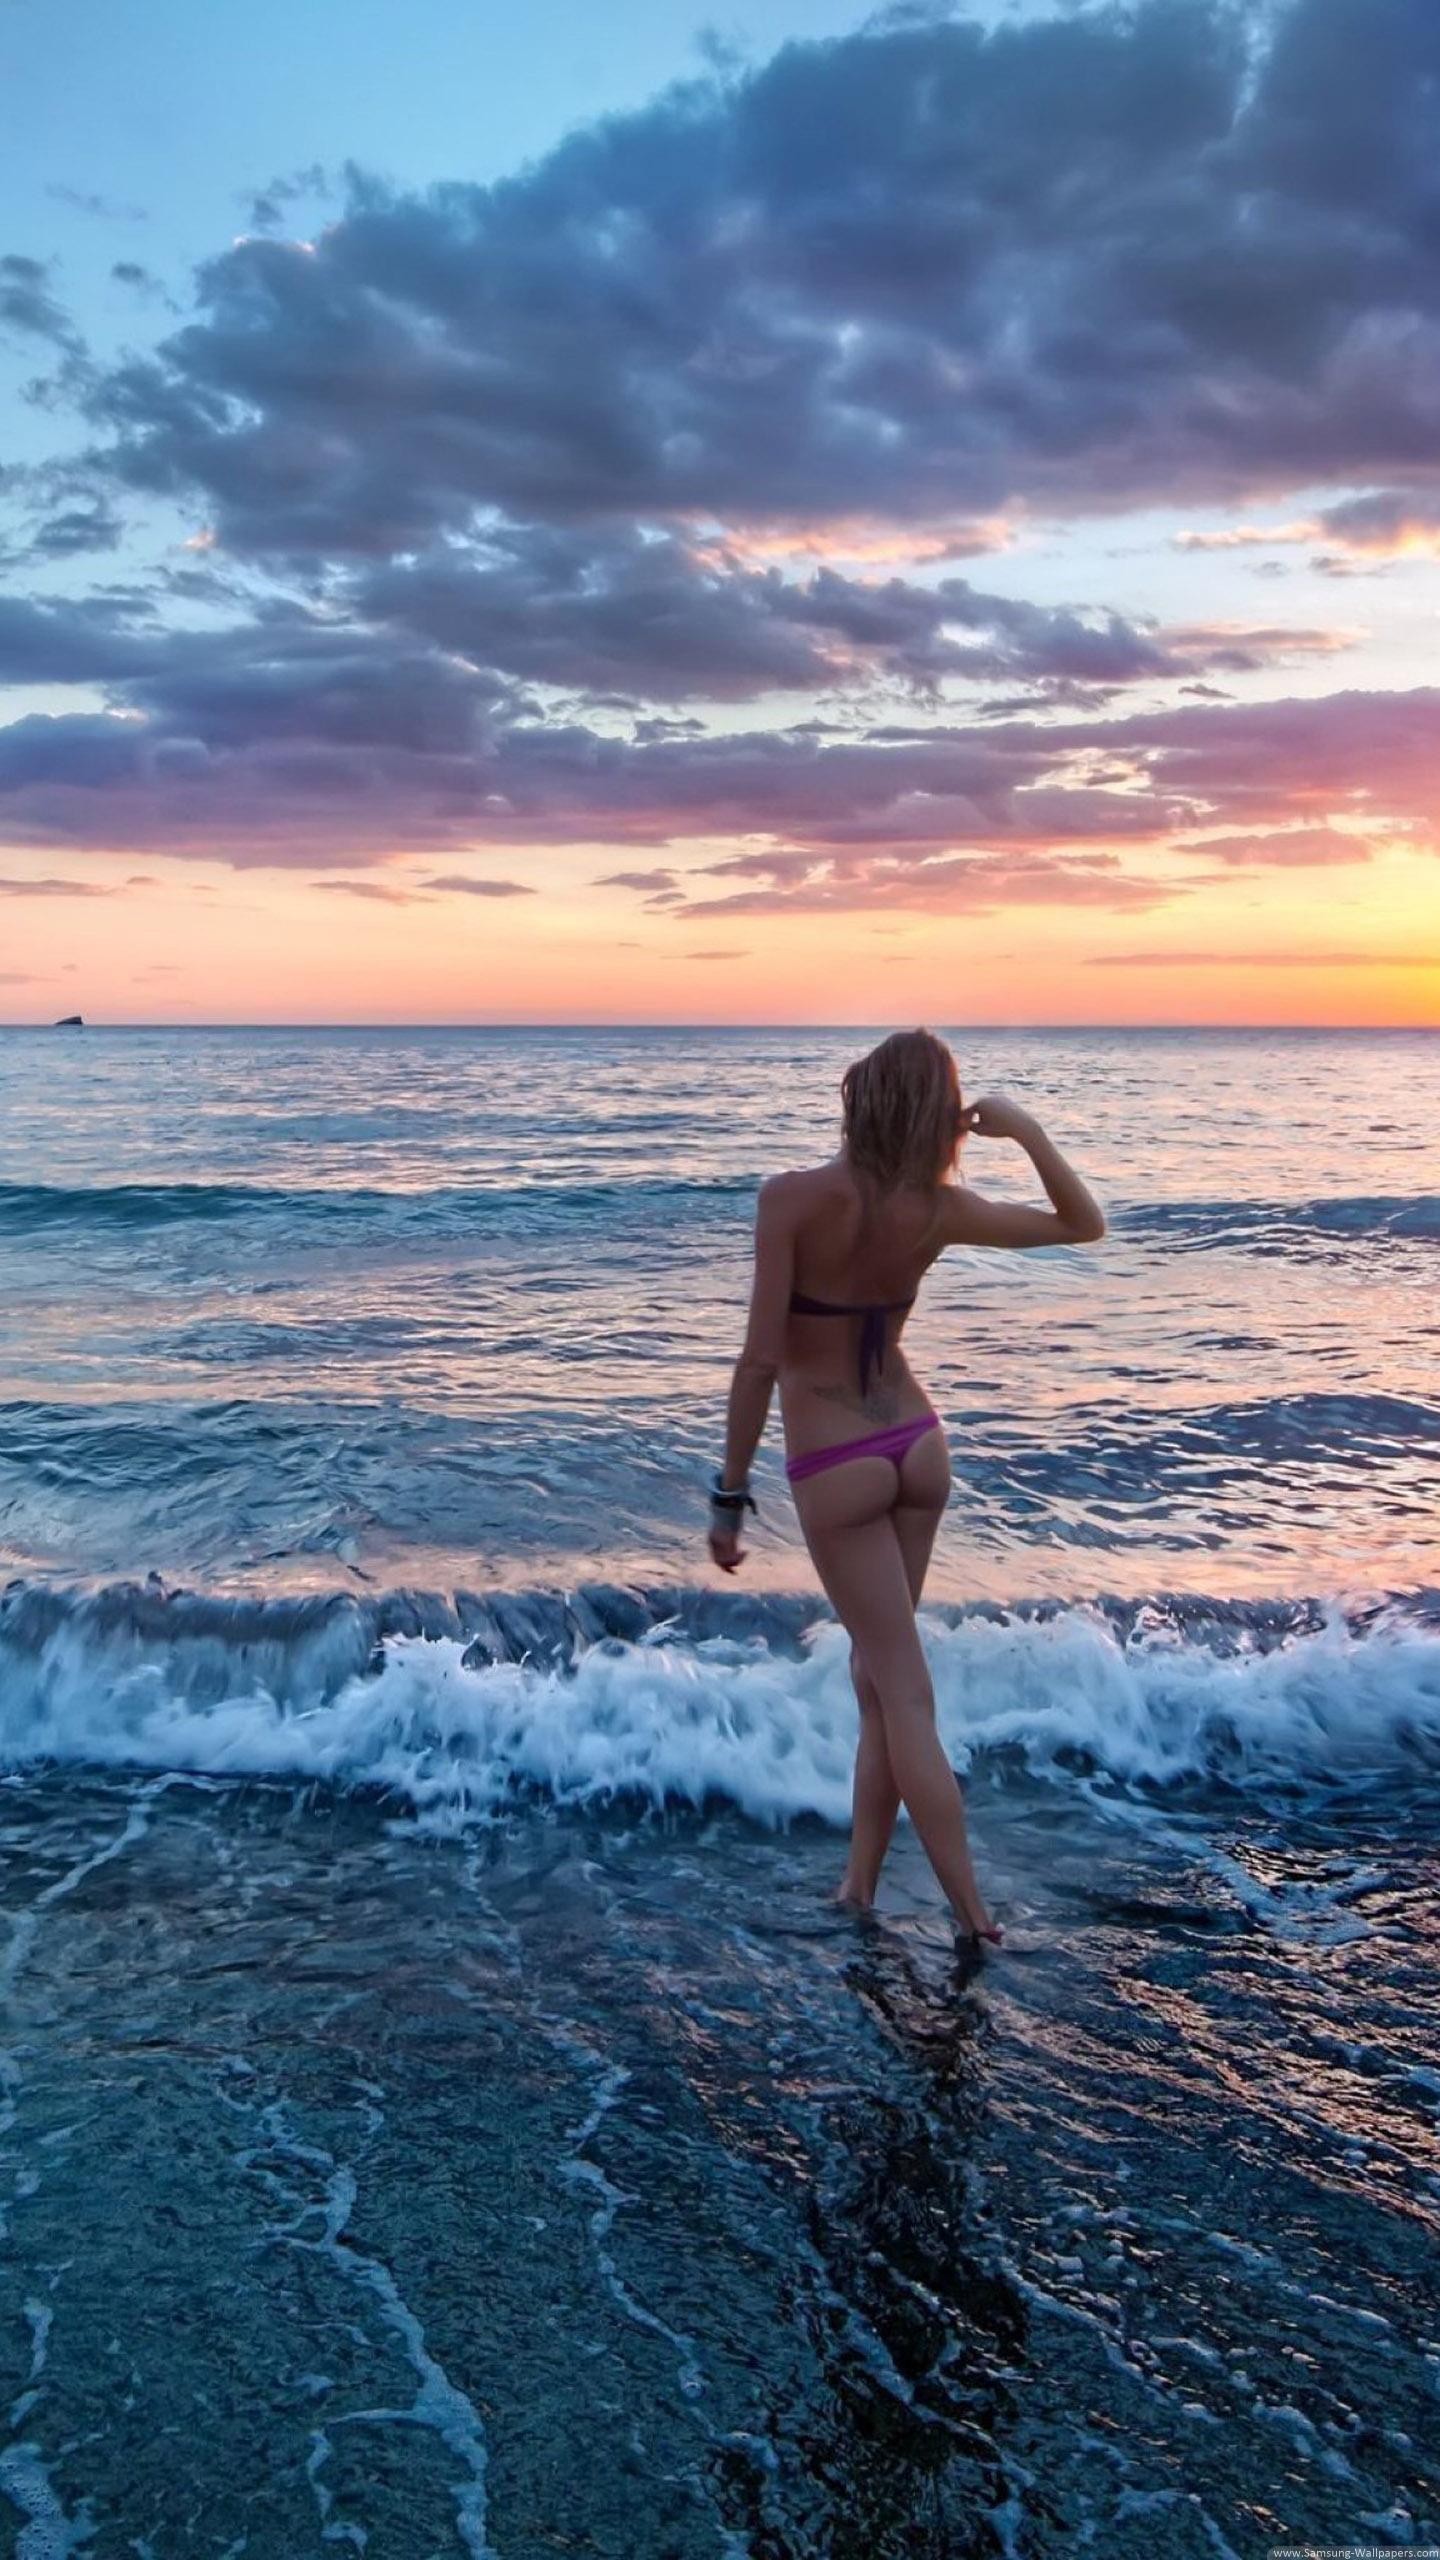 Girl On The Beach Galaxy S6 Wallpaper (1440x2560)